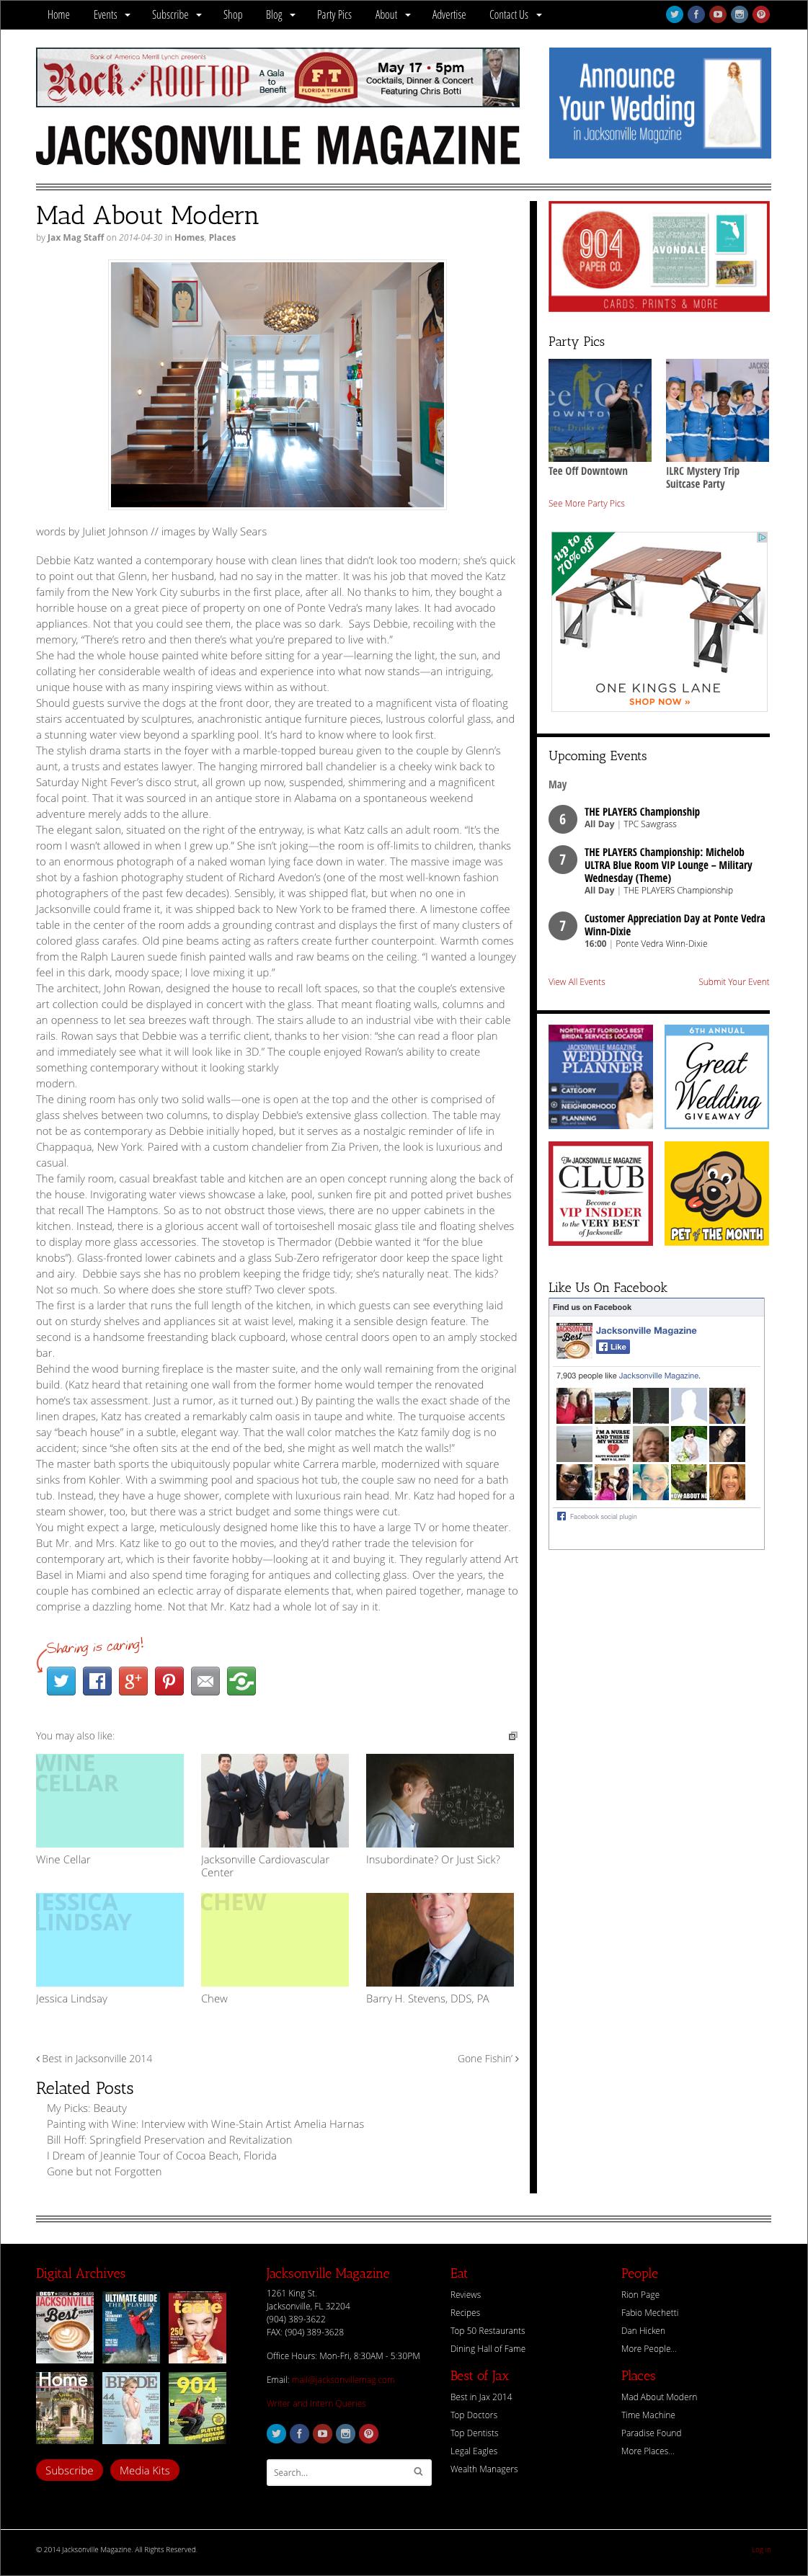 Jacksonville Magazine website screenshot - single article page